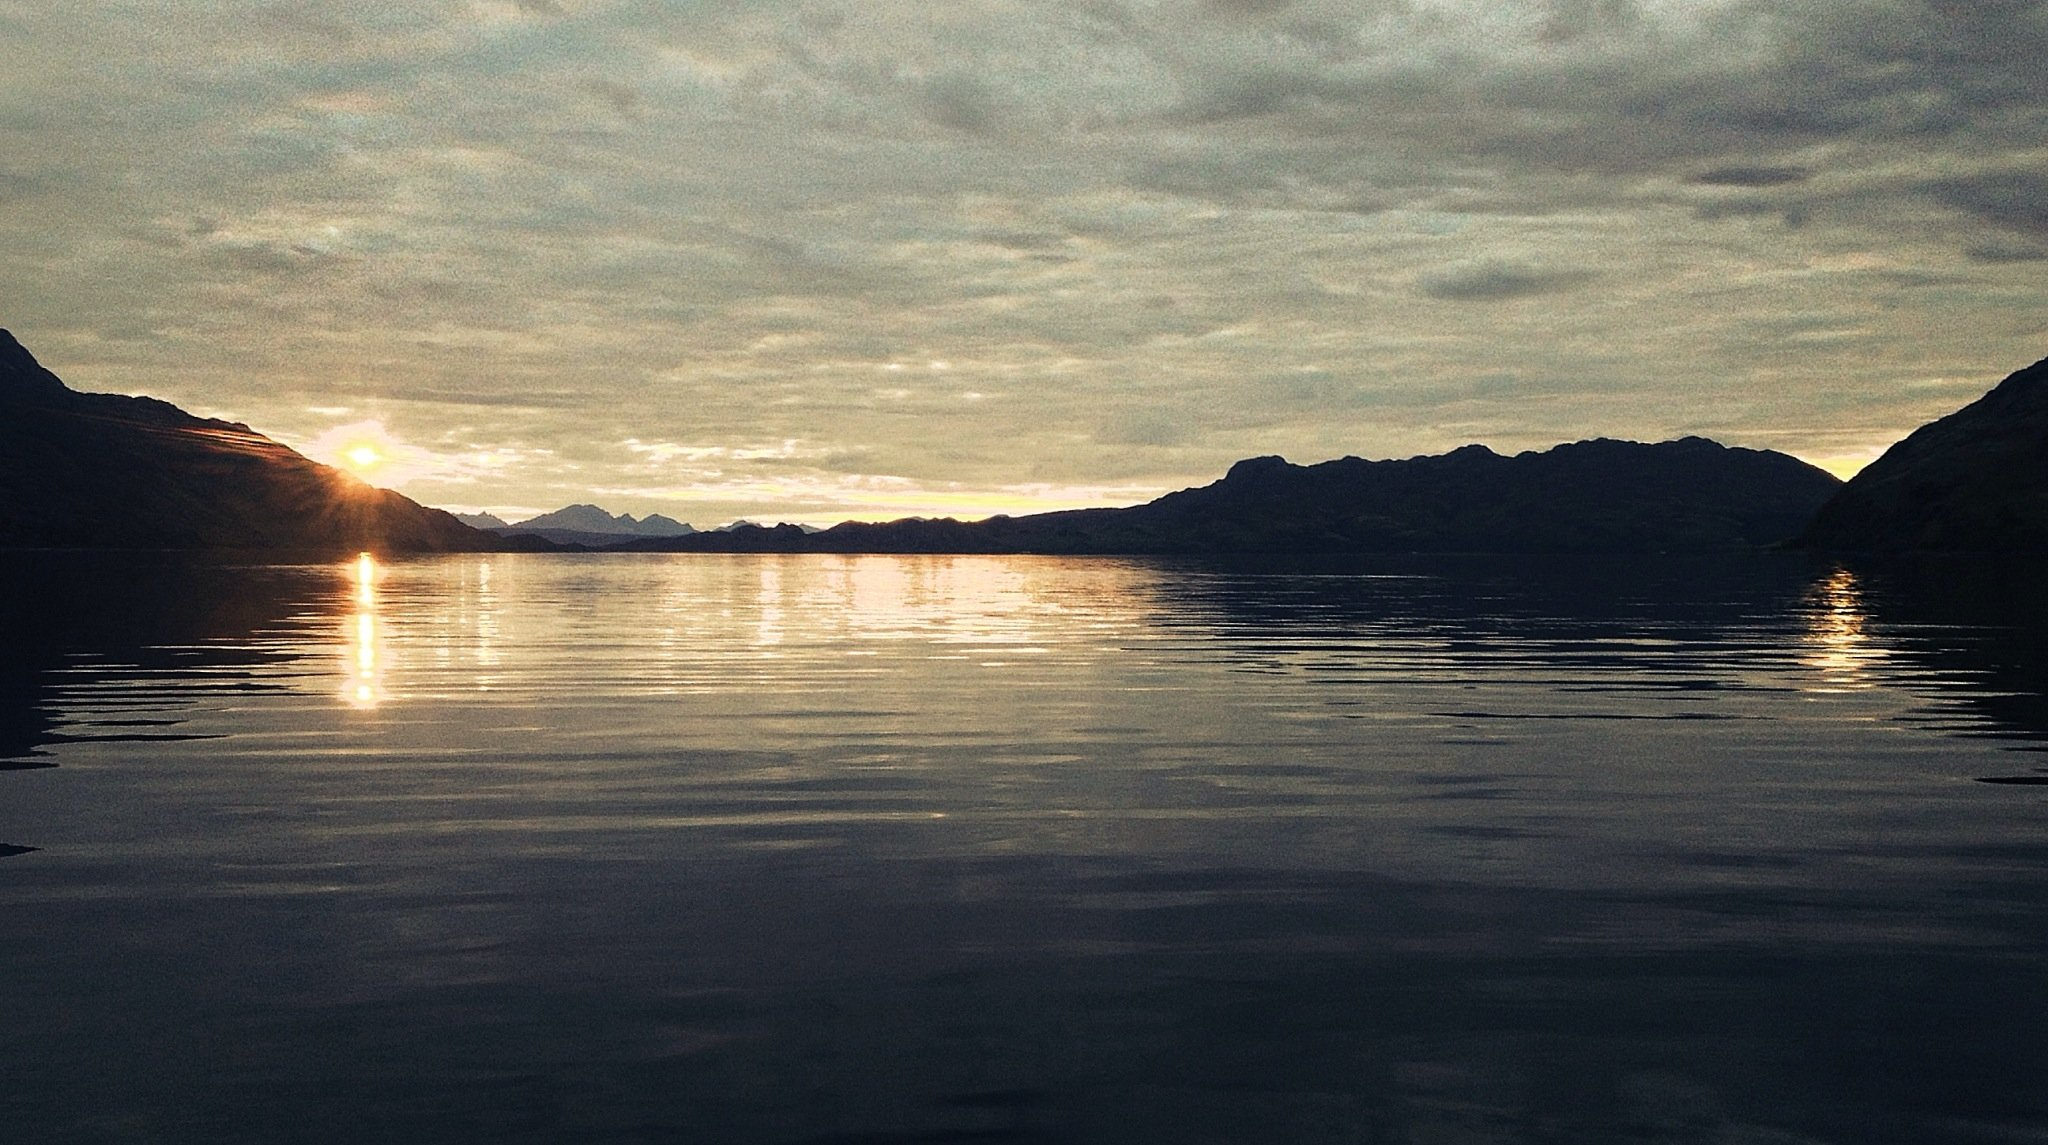 Sunset at Tarbet, Loch Nevis